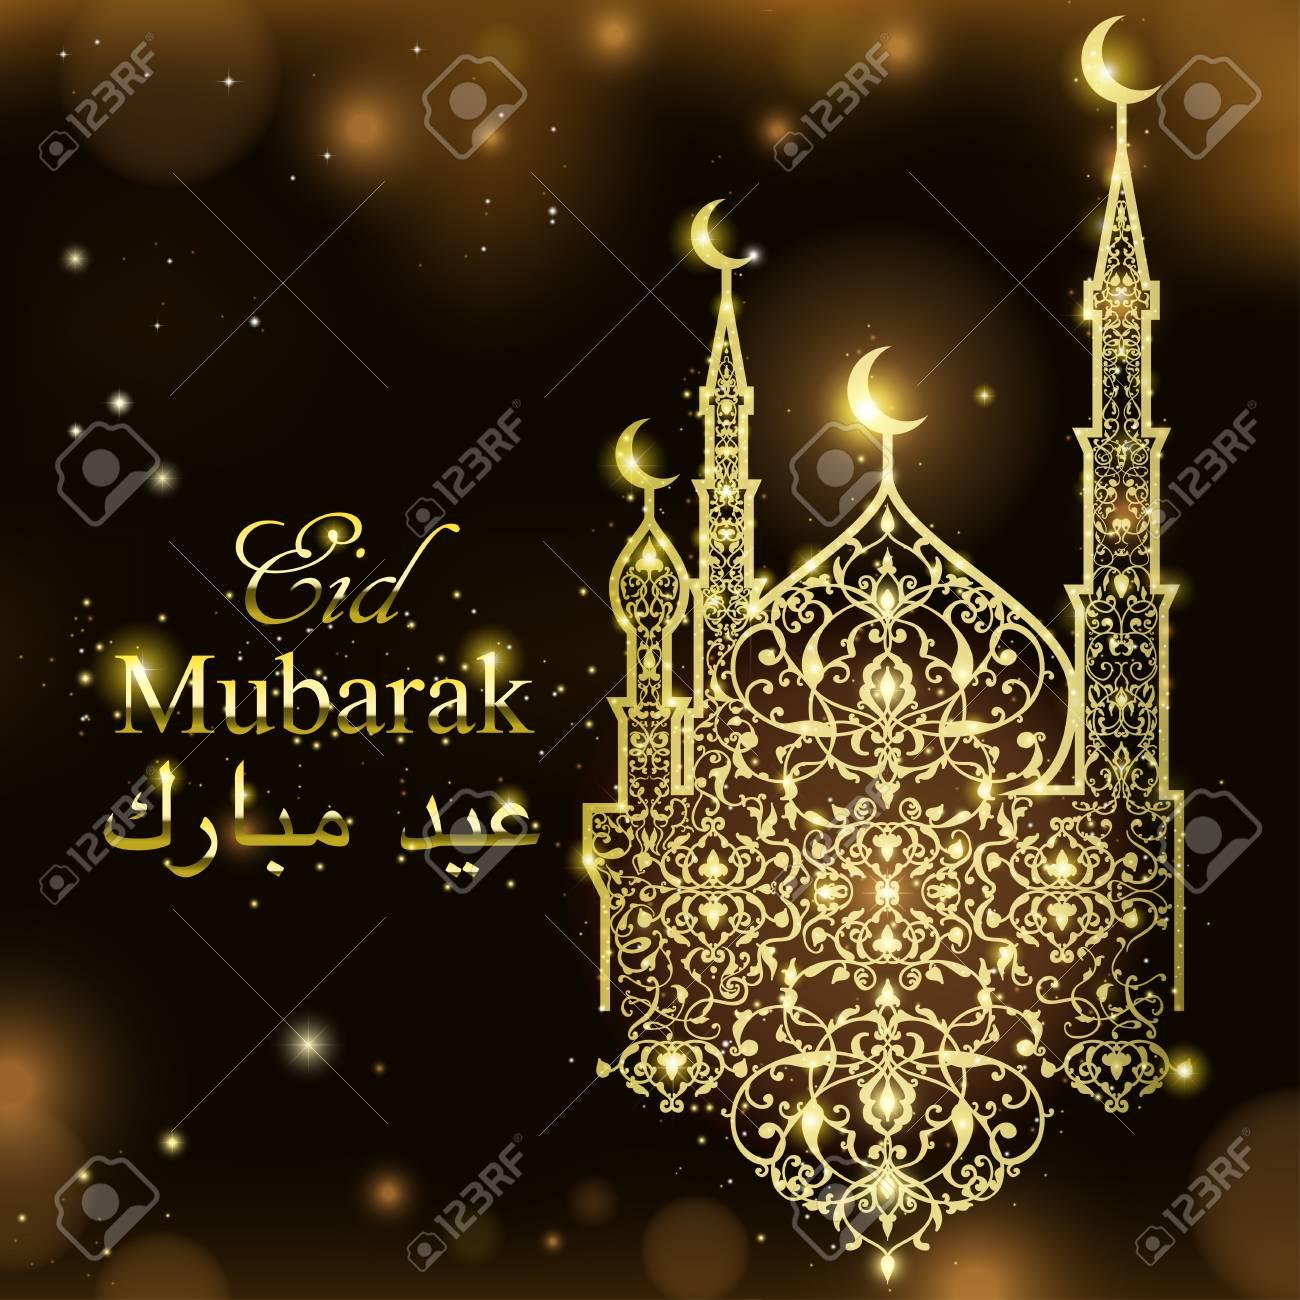 English translate eid mubarak beautiful mosque on sparkling english translate eid mubarak beautiful mosque on sparkling lights and stars background islamic celebration arubaitofo Image collections